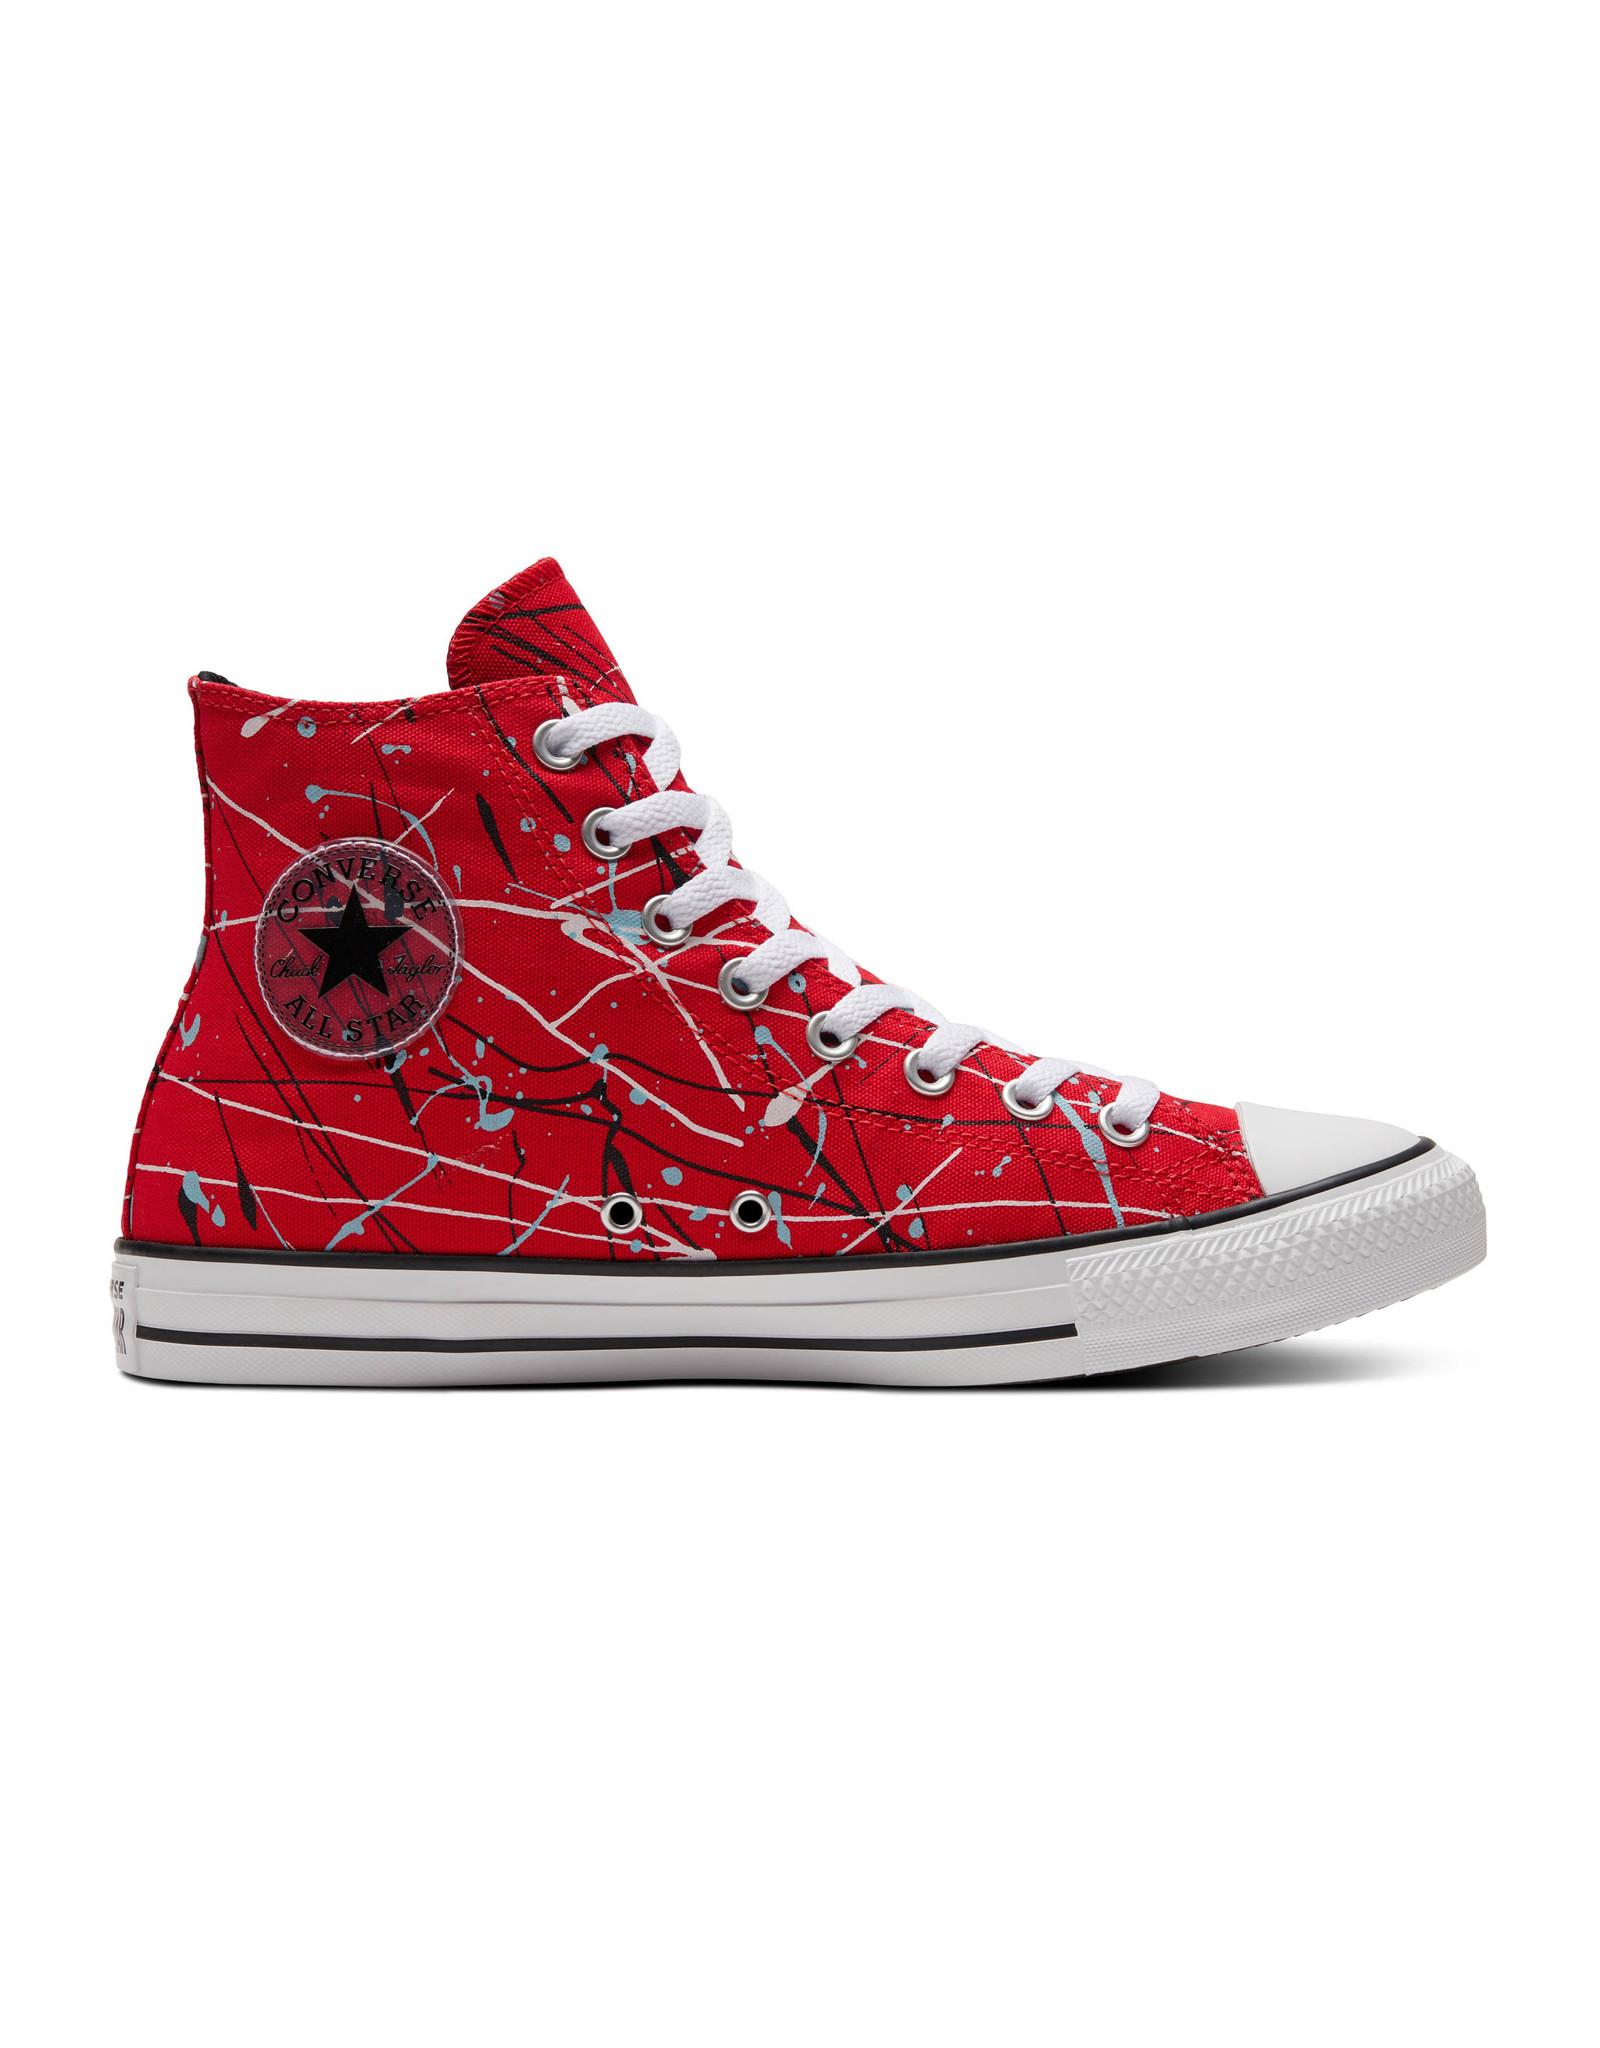 CONVERSE CHUCK TAYLOR ALL STAR HI UNIVERSITY RED/WHITE/BLACK C21RAR-170806C